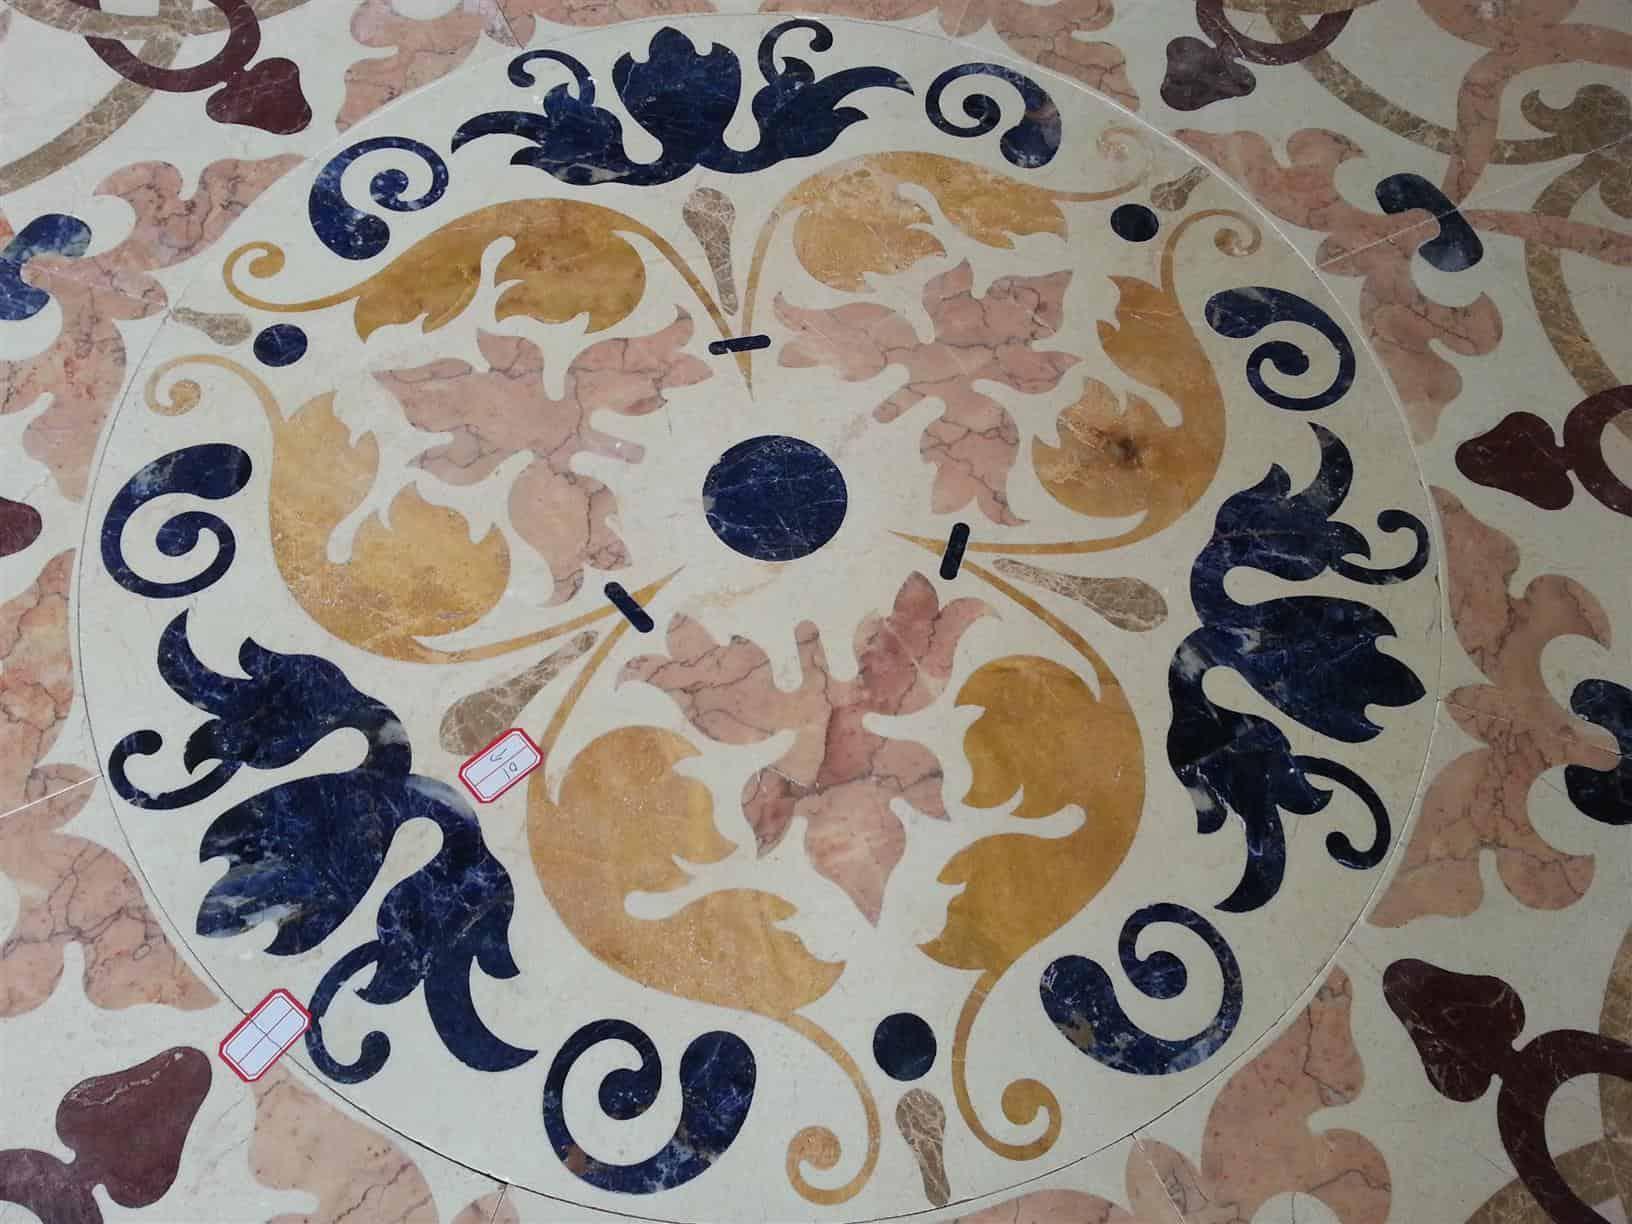 Palace Center piece